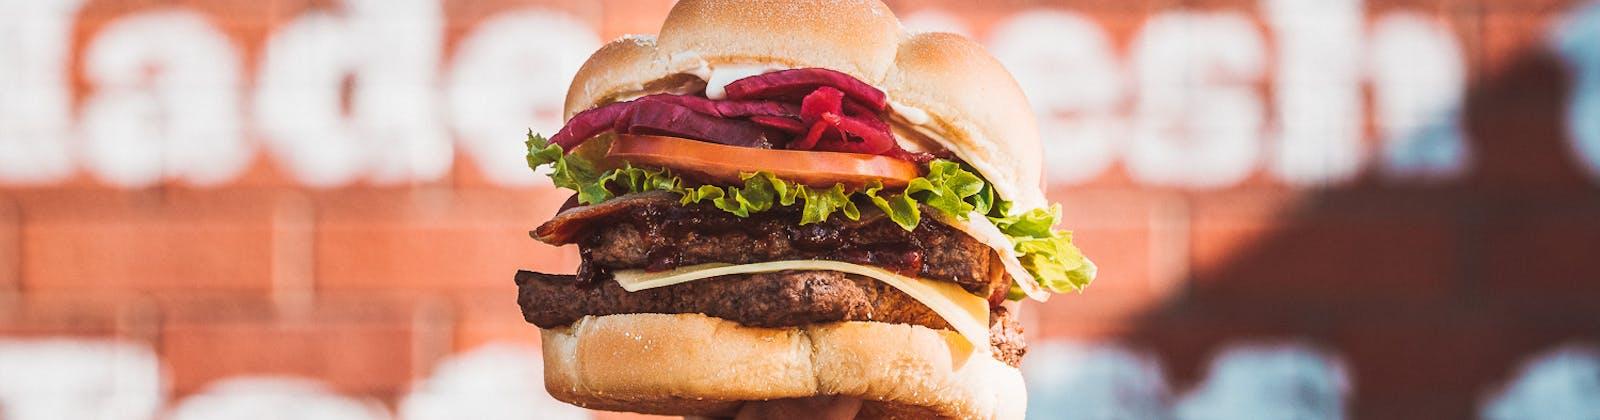 wendys korean bbq burger